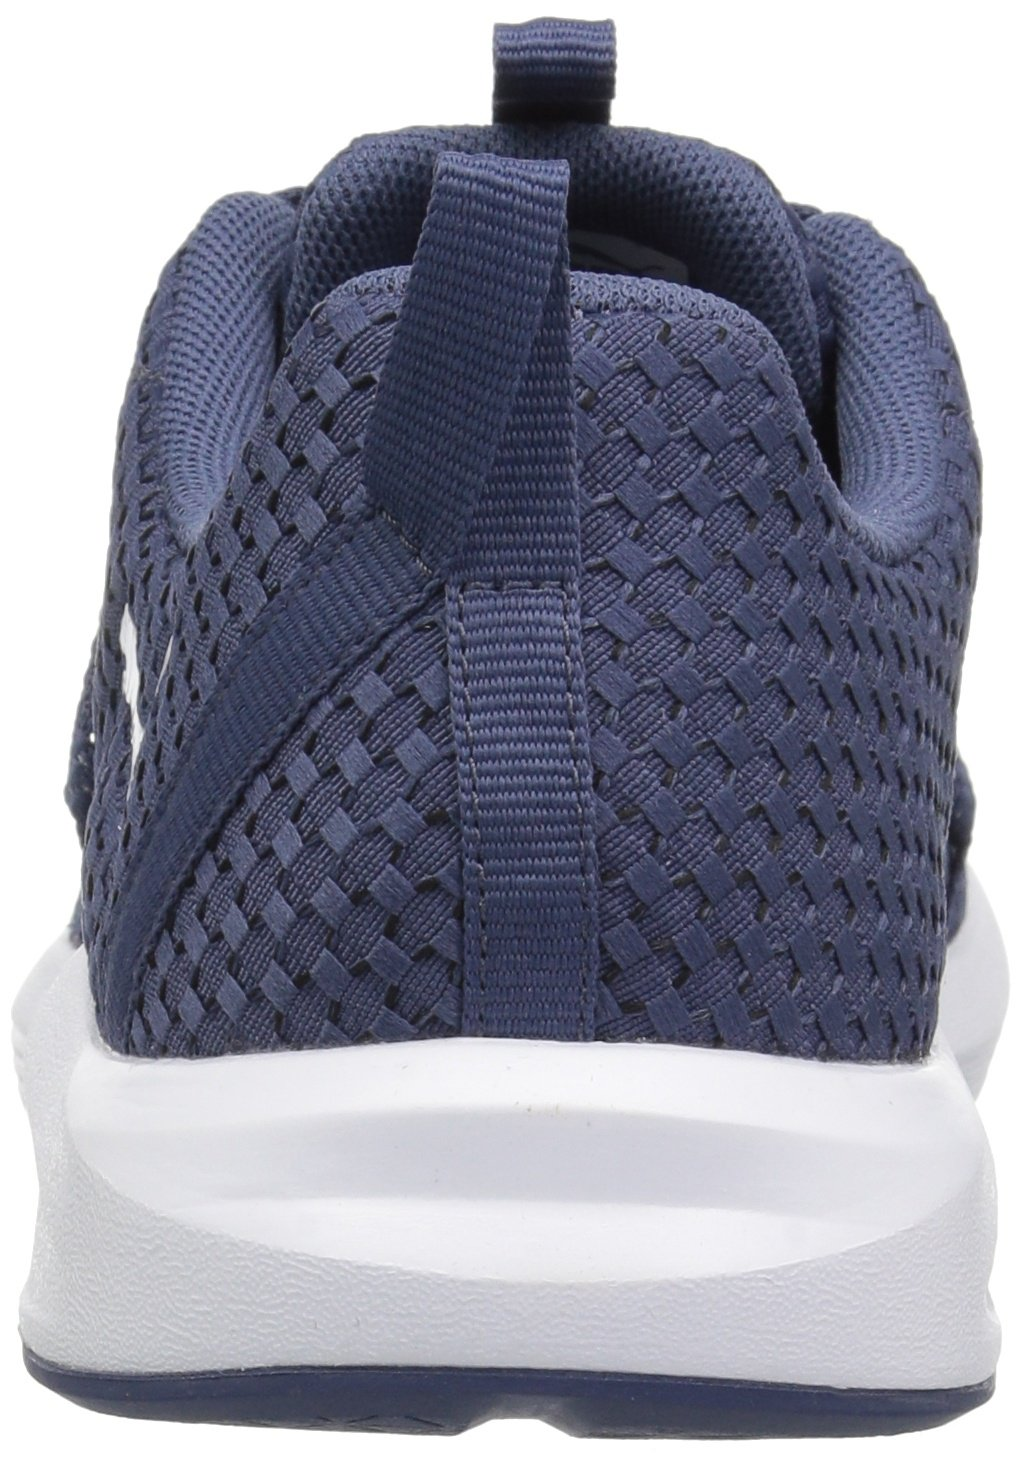 PUMA Women's Prowl B071XD4G8H Alt Weave Wn Sneaker B071XD4G8H Prowl 8 M US|Blue Indigo-puma White 433bd6